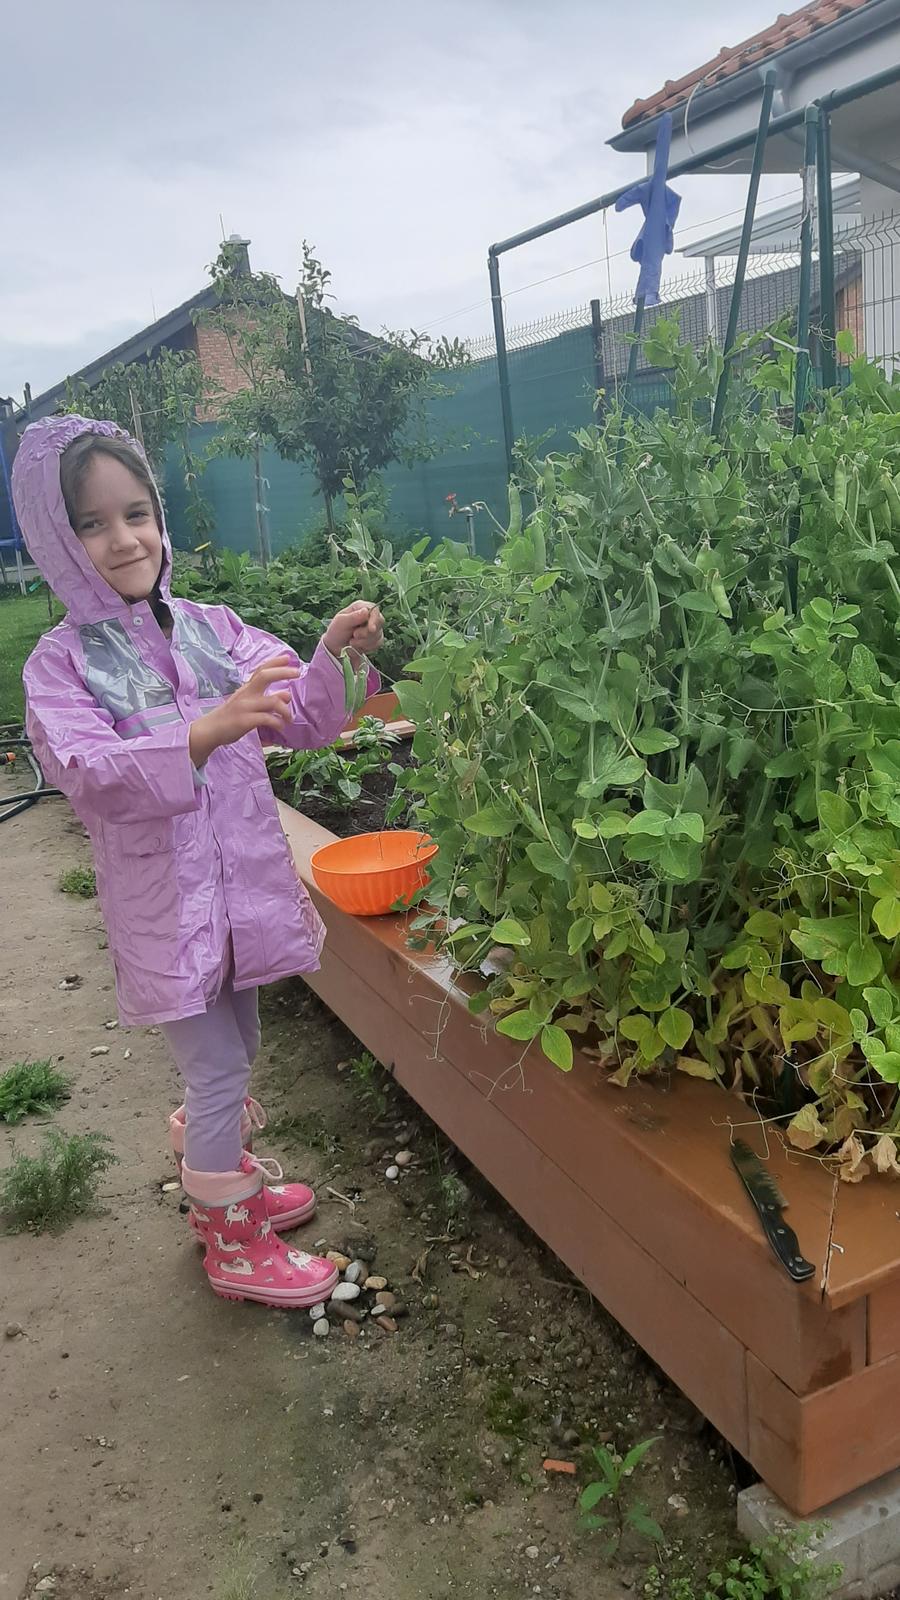 🏠🌞🌺❤🌷 Zahrada a jej dalsi rok...2020 🌱🐞🐛🦋🍓🥕🍅🌺❤ - Moja mala pomocnicka 😃